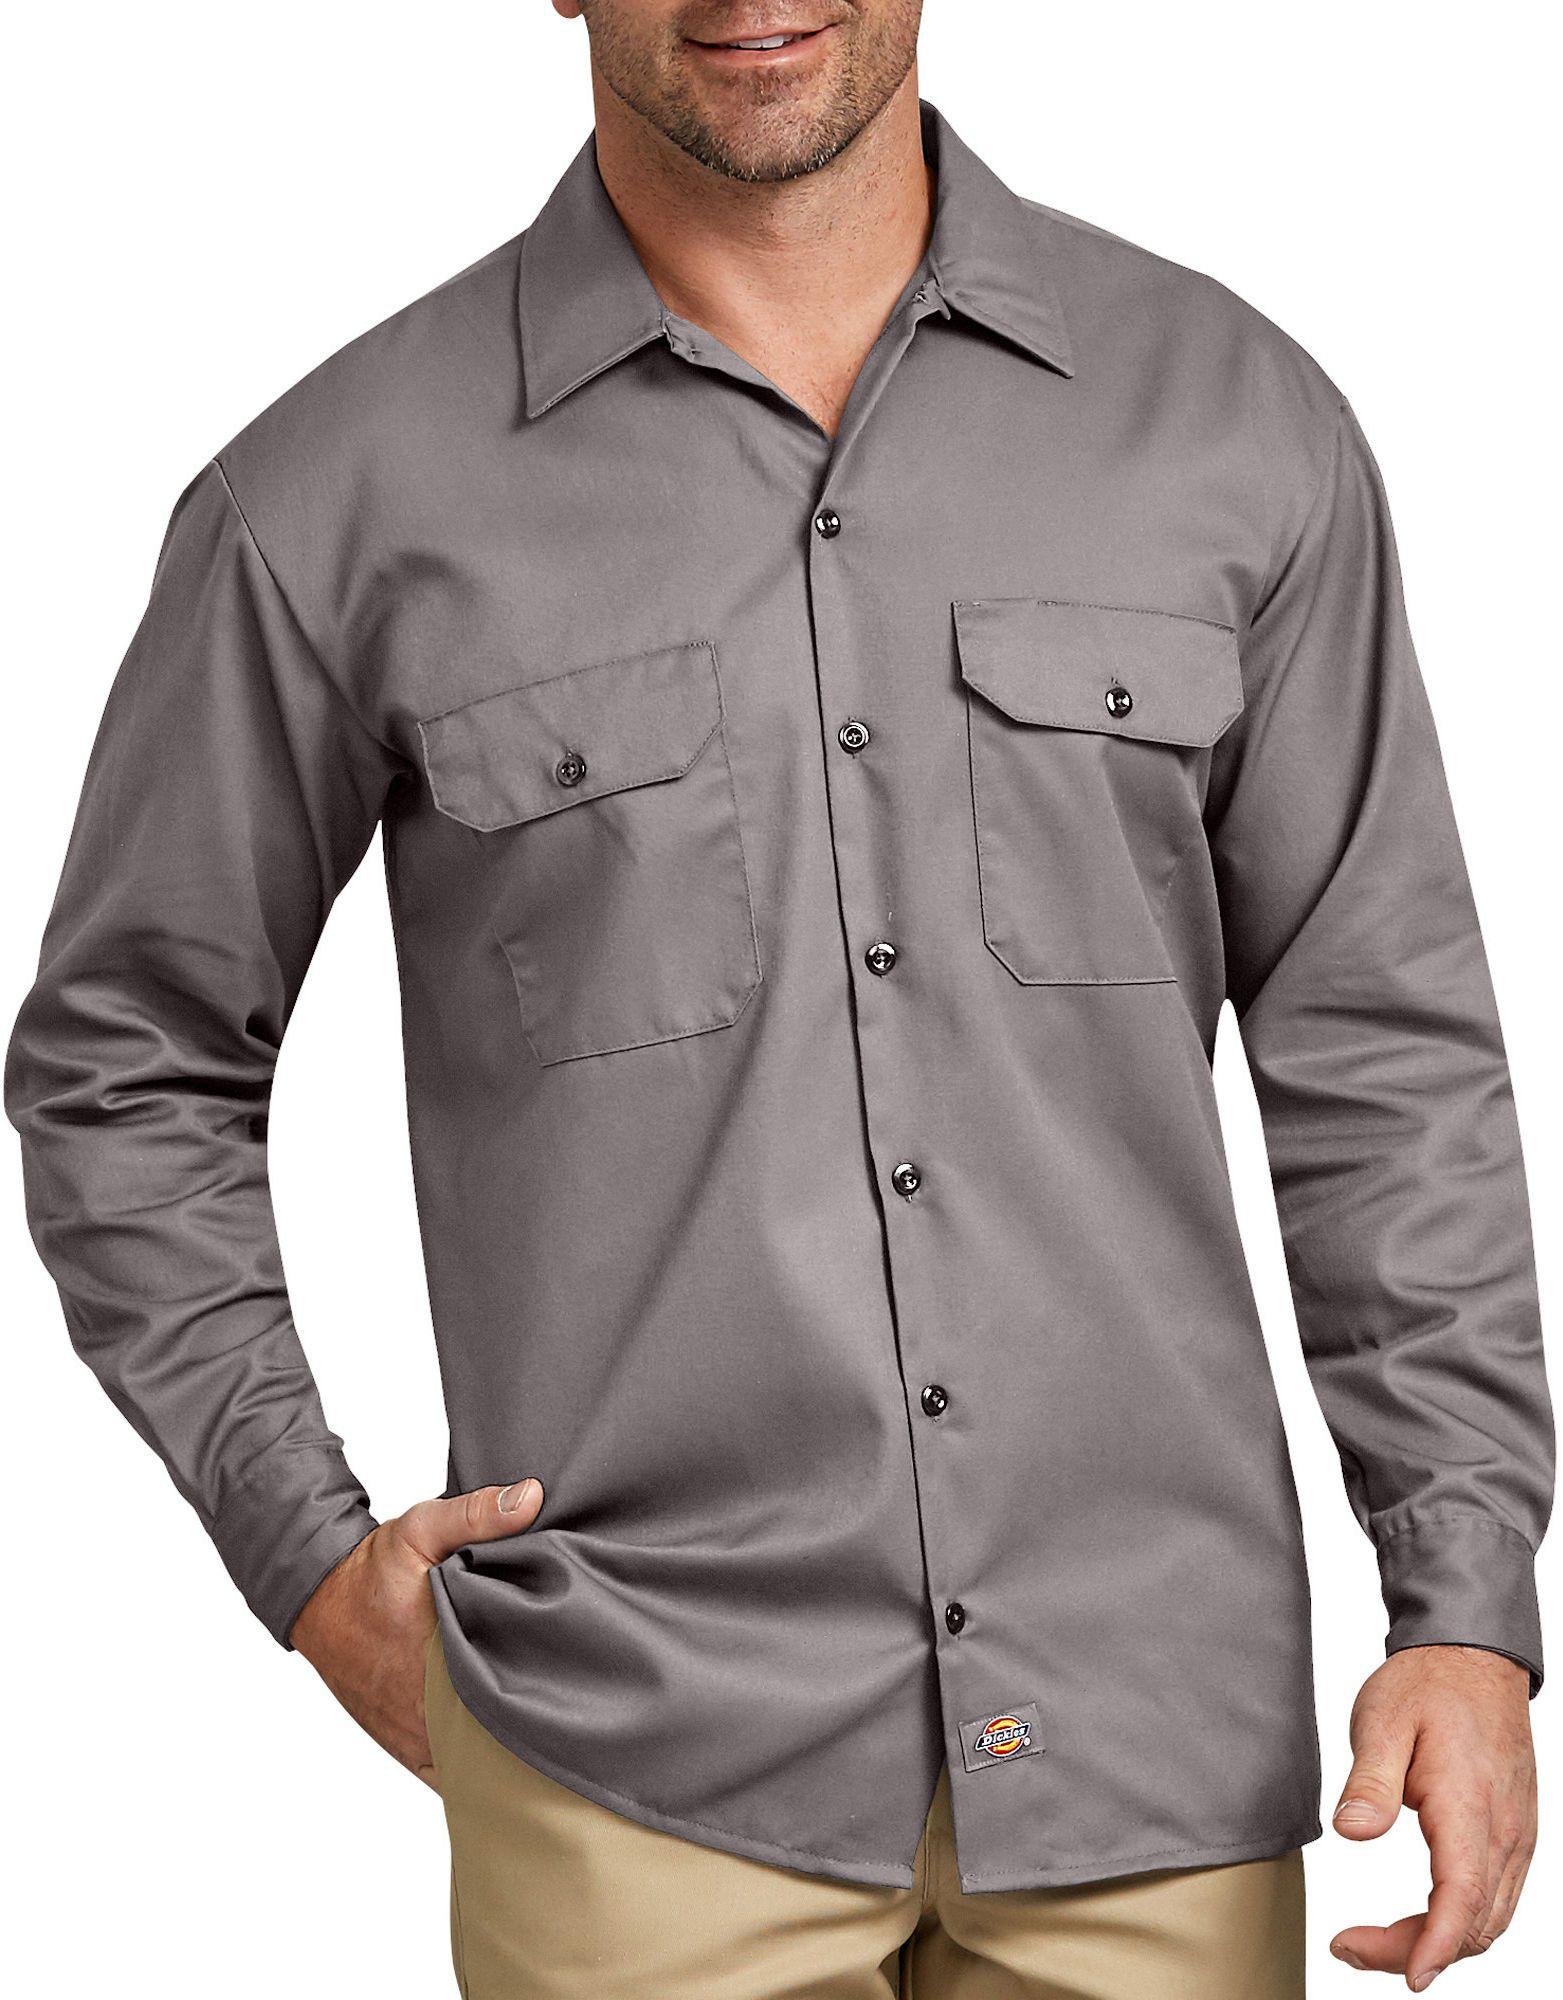 Long Sleeve Work Shirt Mens Shirts Dickies Mens Work Pants Work Shirts Shirts